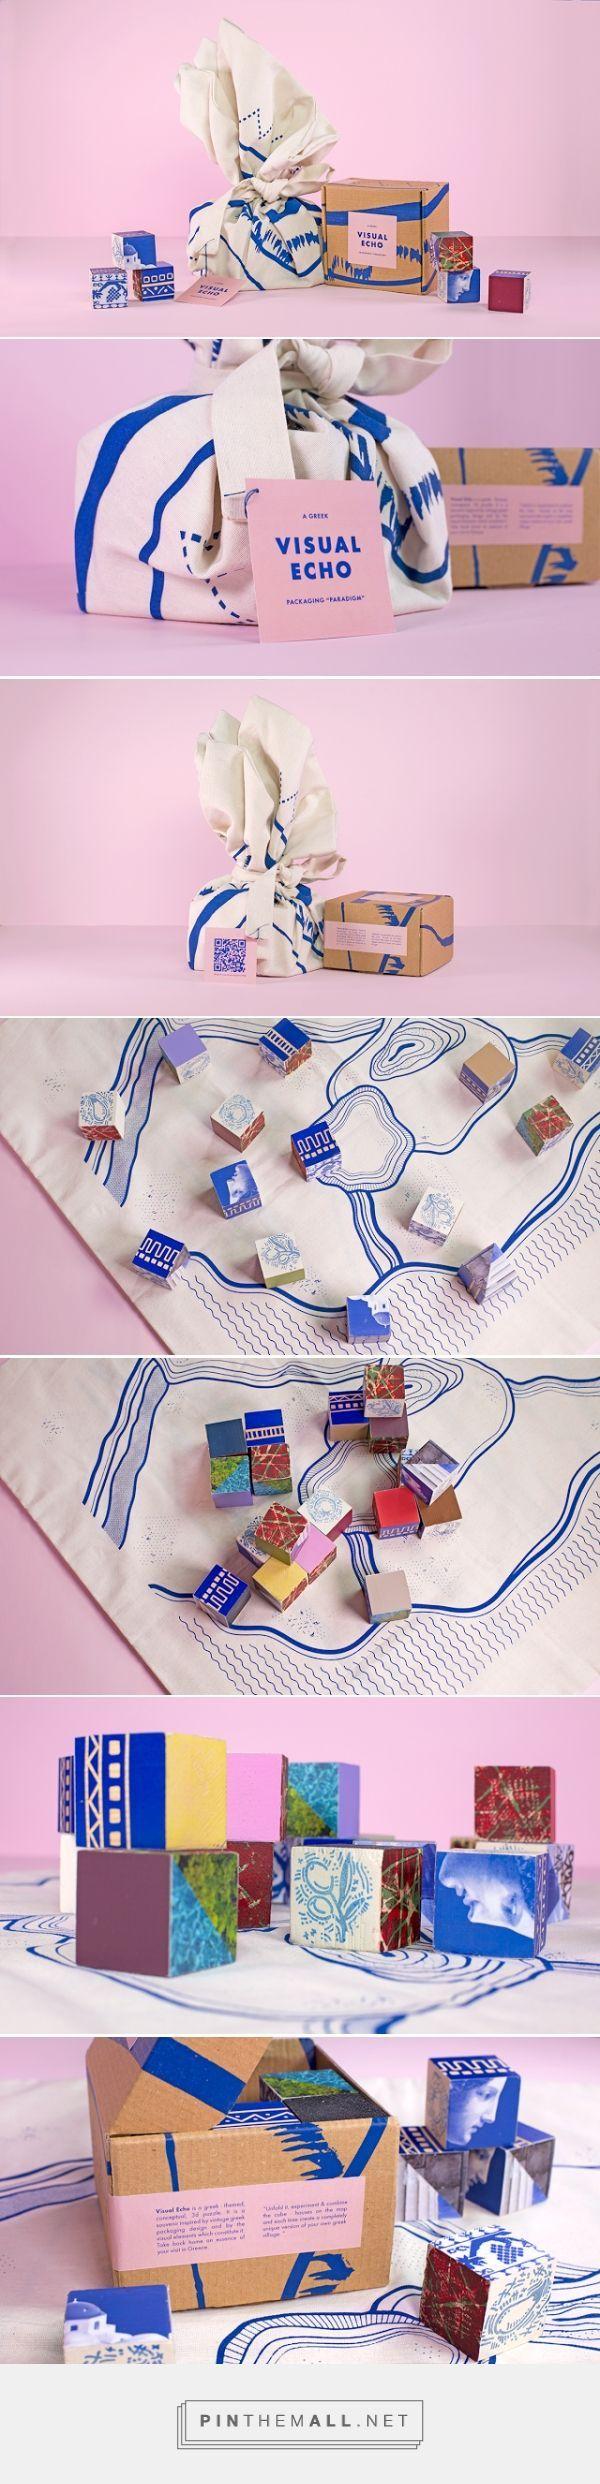 Designer Len Günstig 1133 best things images on office supplies product